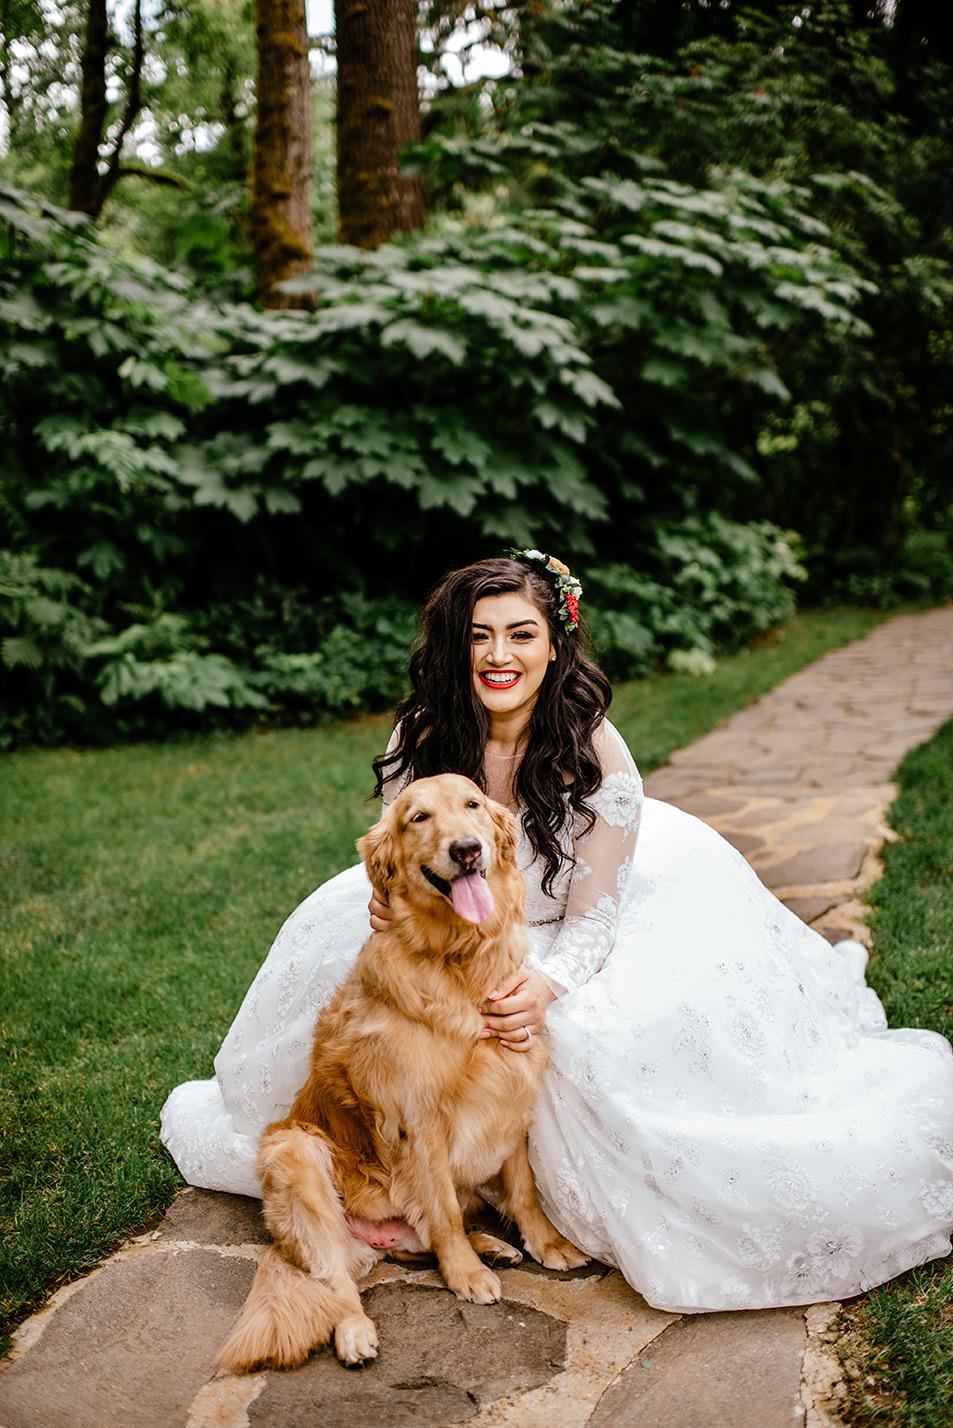 Spanish-inspired-wedding-bridal-veil-lakes-15.jpg